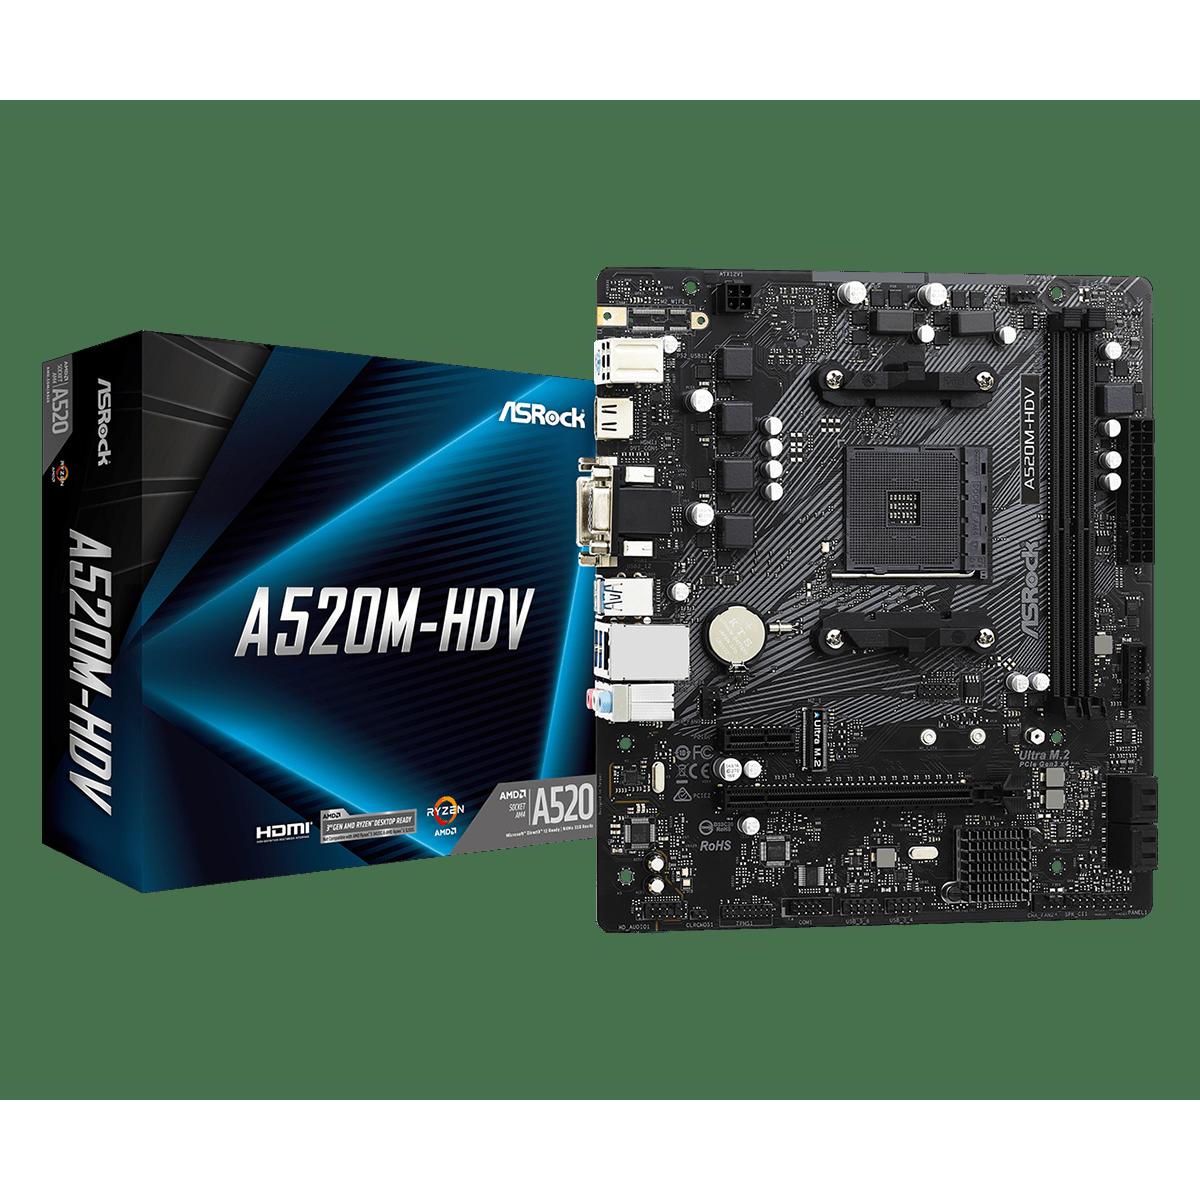 Placa Mãe AsRock A520M-HDV, A520, AMD AM4, mATX, DDR4